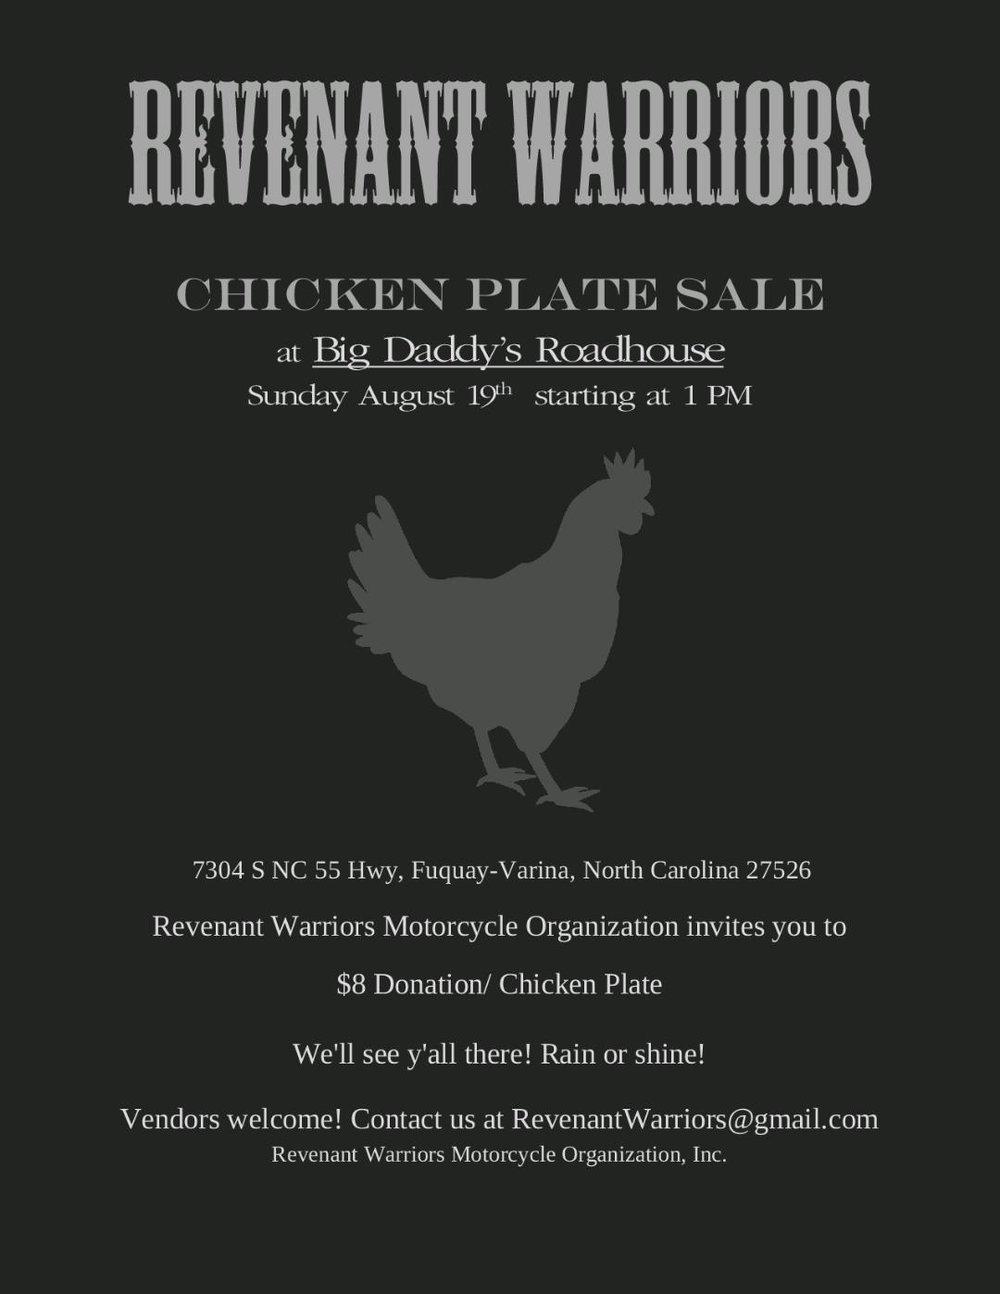 RWMO.Chicken.Plate.2018.08.jpg